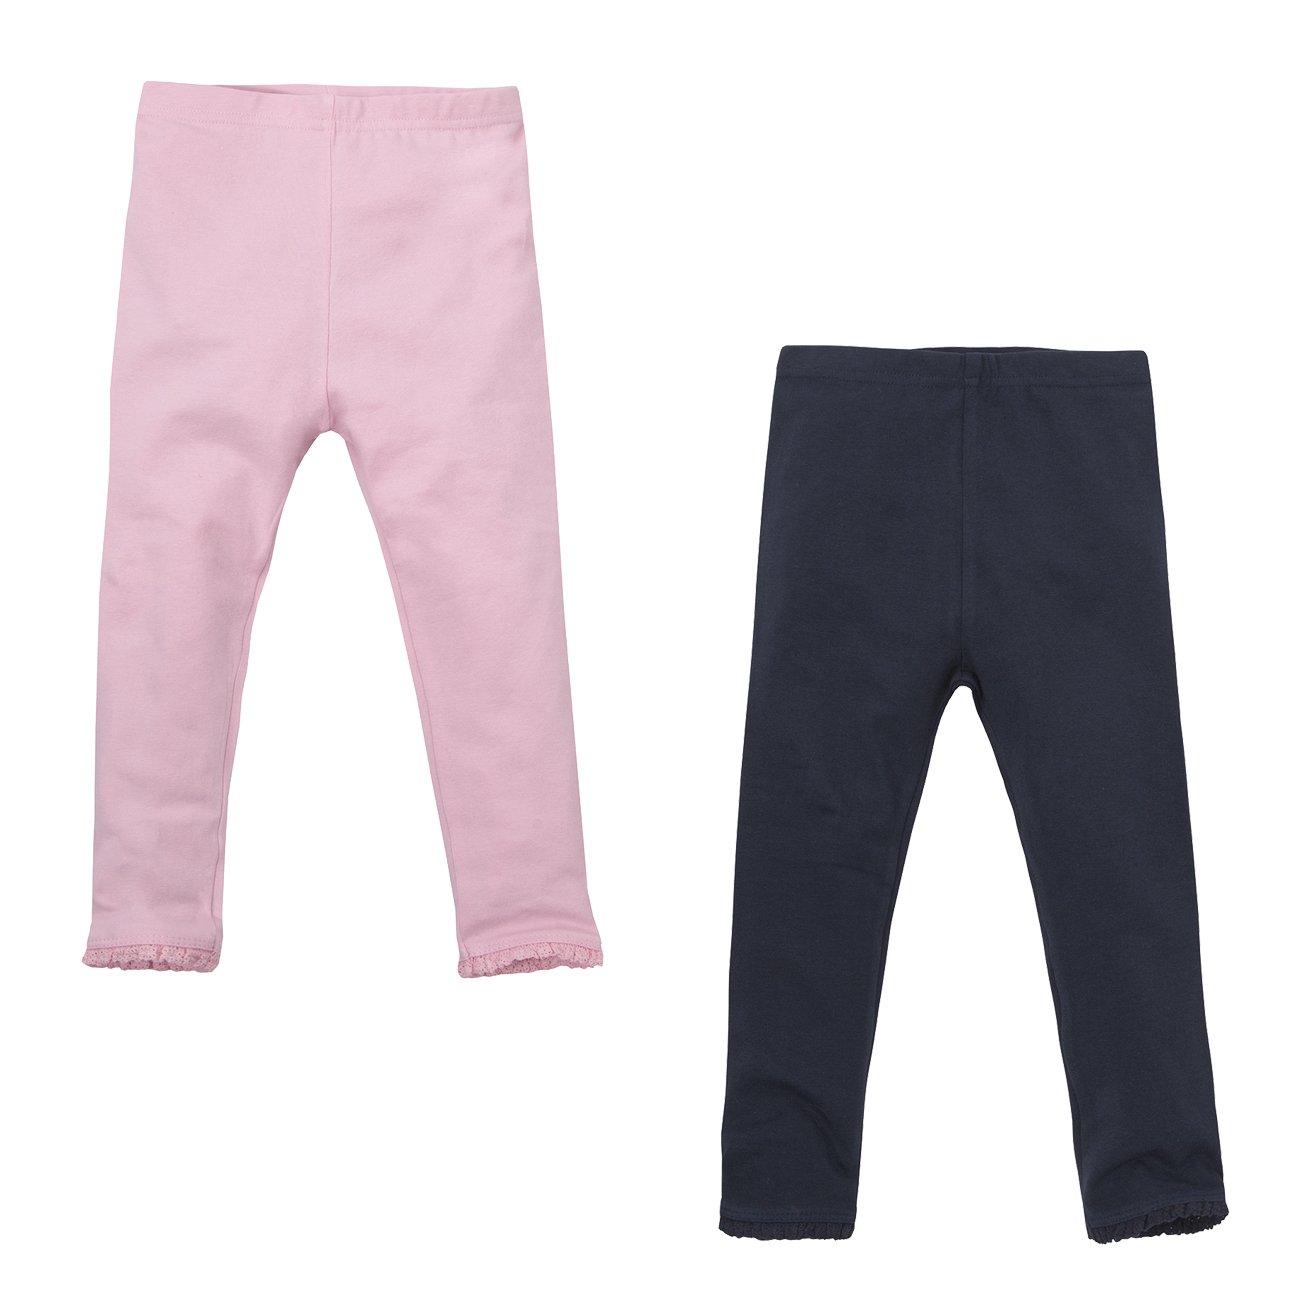 Minikidz Infant Girls 2-Pack Leggings with Pretty Lace Trim